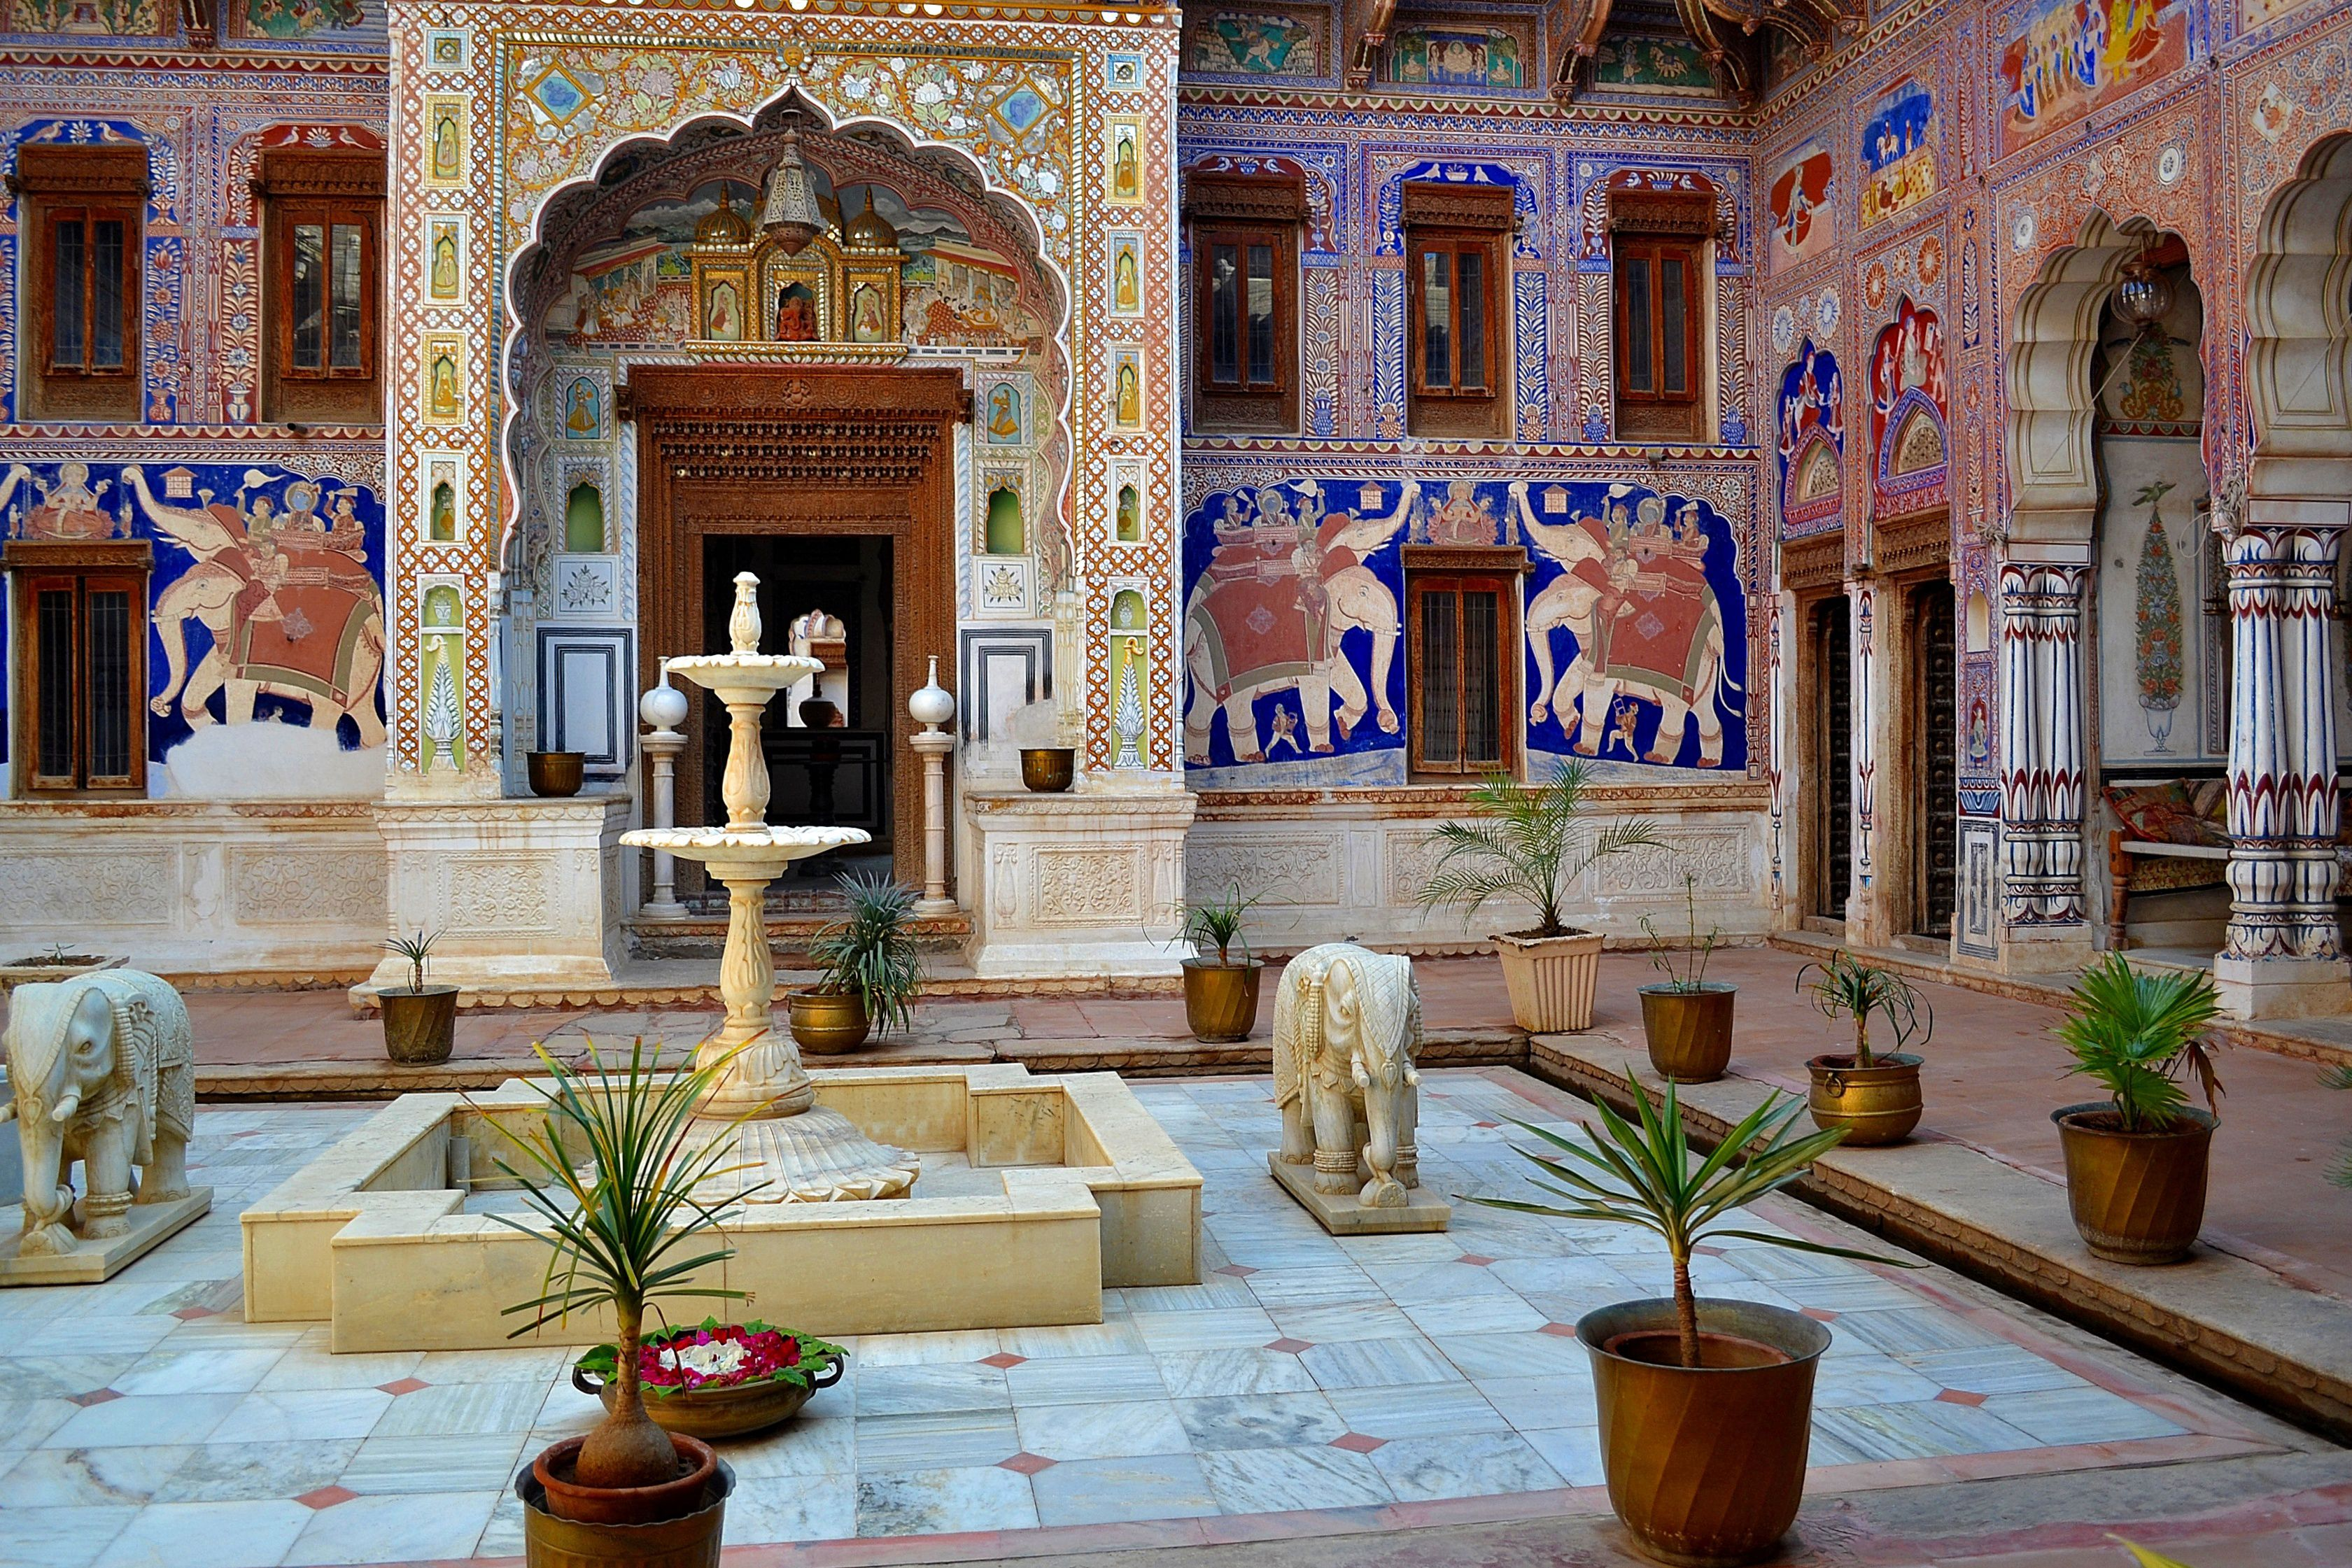 Shekhawati Rajasthan How To Visit The Painted Havelis